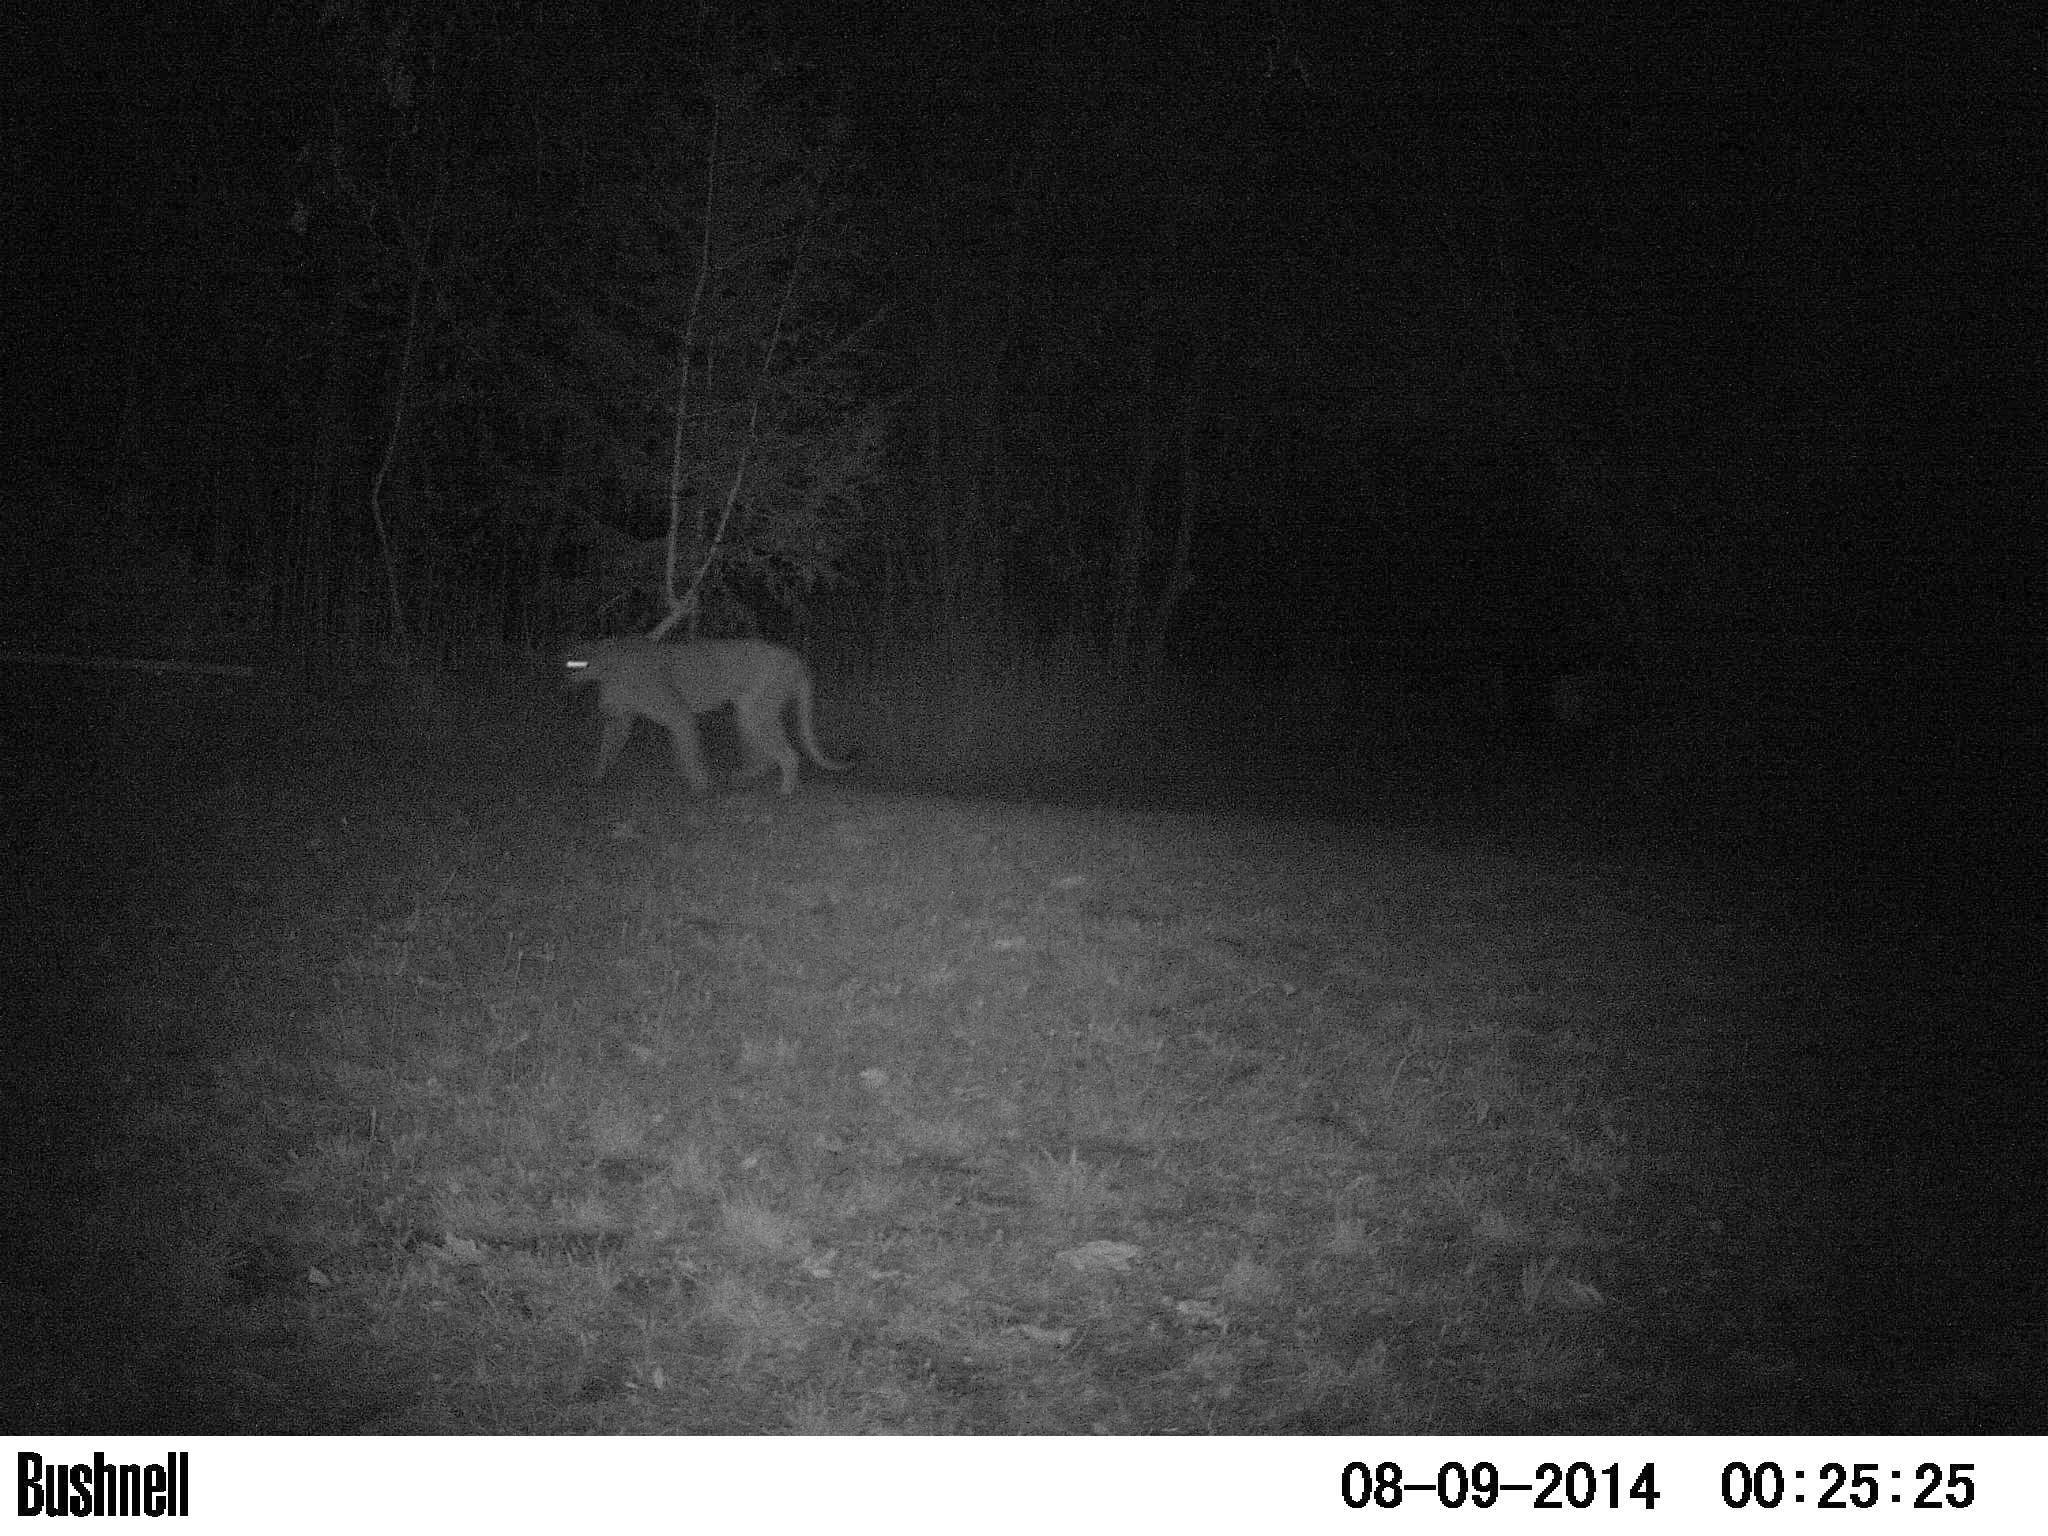 cougar 8-9-2014